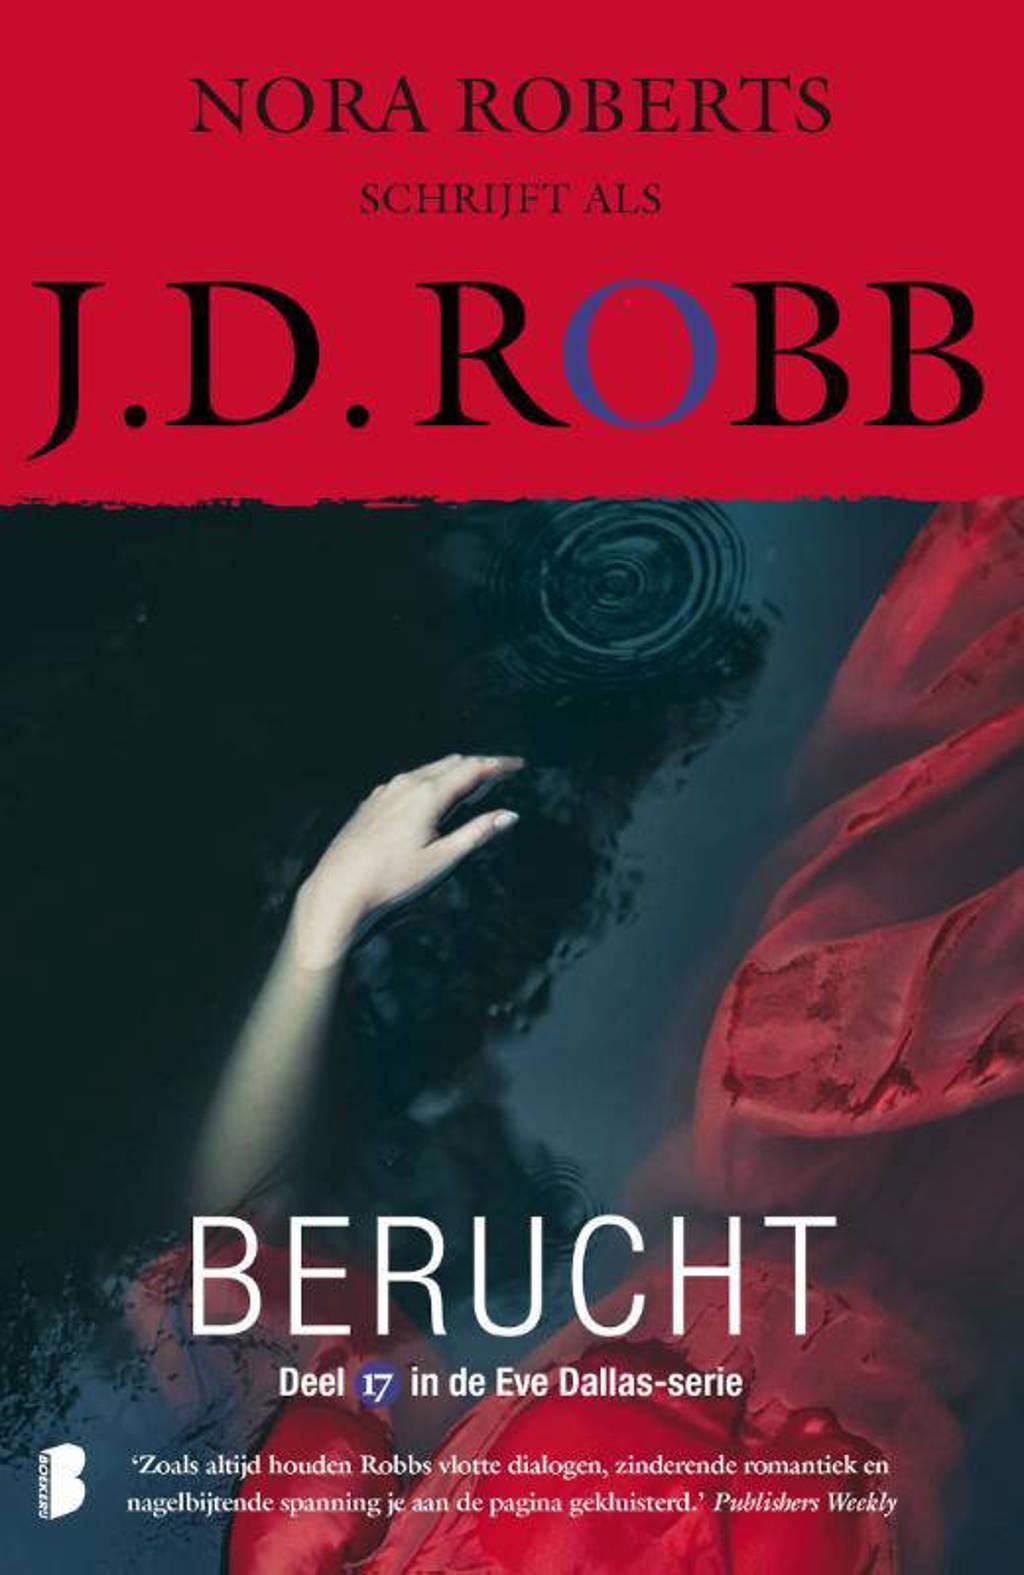 Eve Dallas: Berucht - J.D. Robb